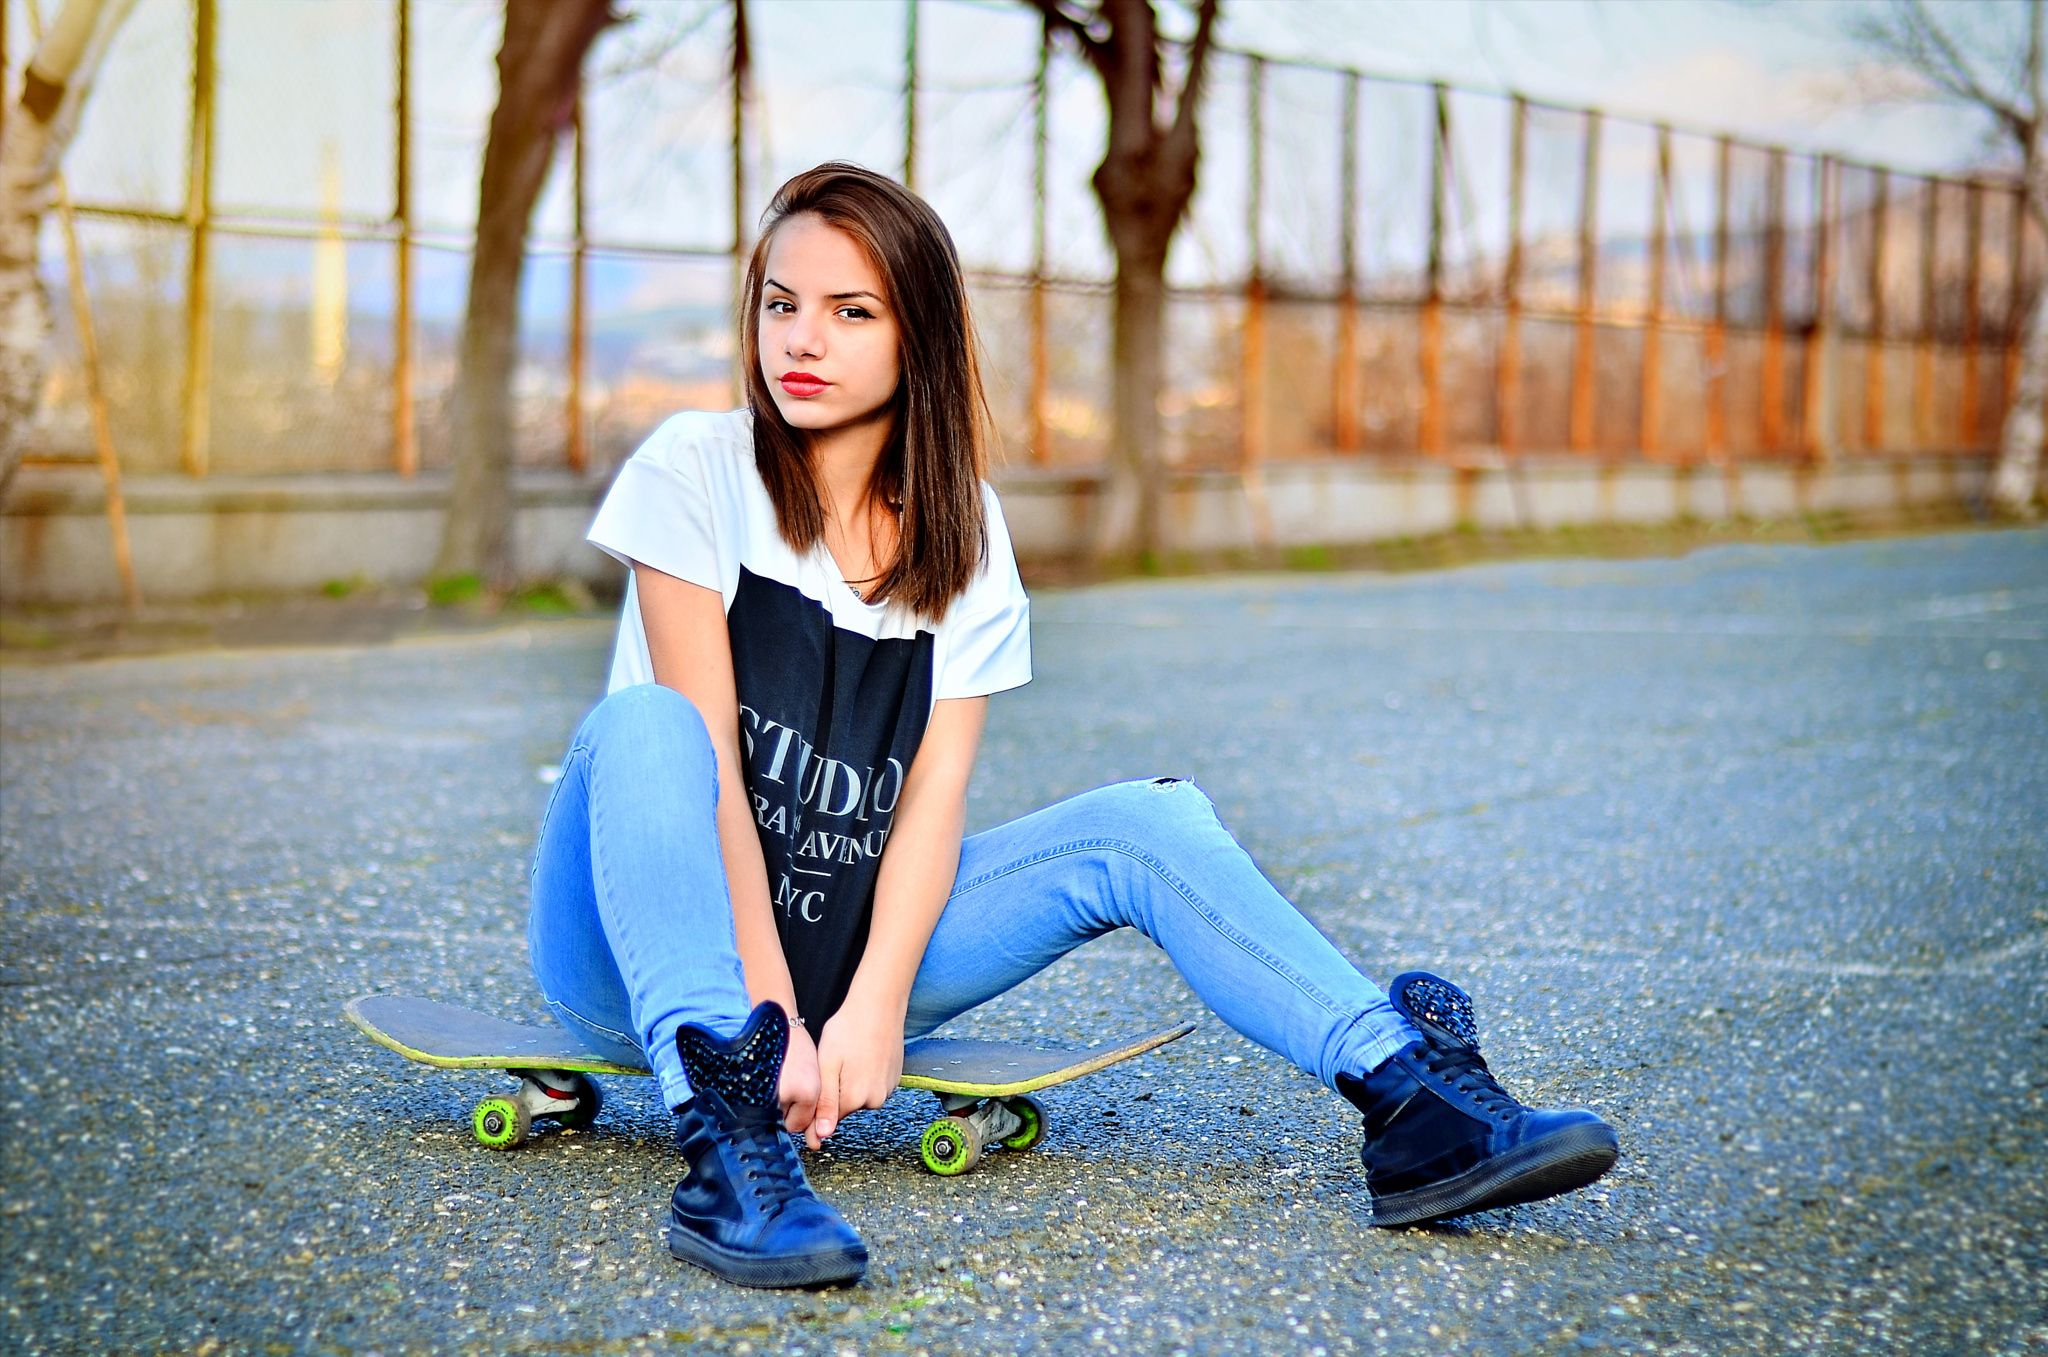 Download Wallpaper Skateboard, Bulgaria, Portrait, Model, Ikoseomer, Shooting, Skate, Girl, Fashion, section девушки Resolution 2048x1357